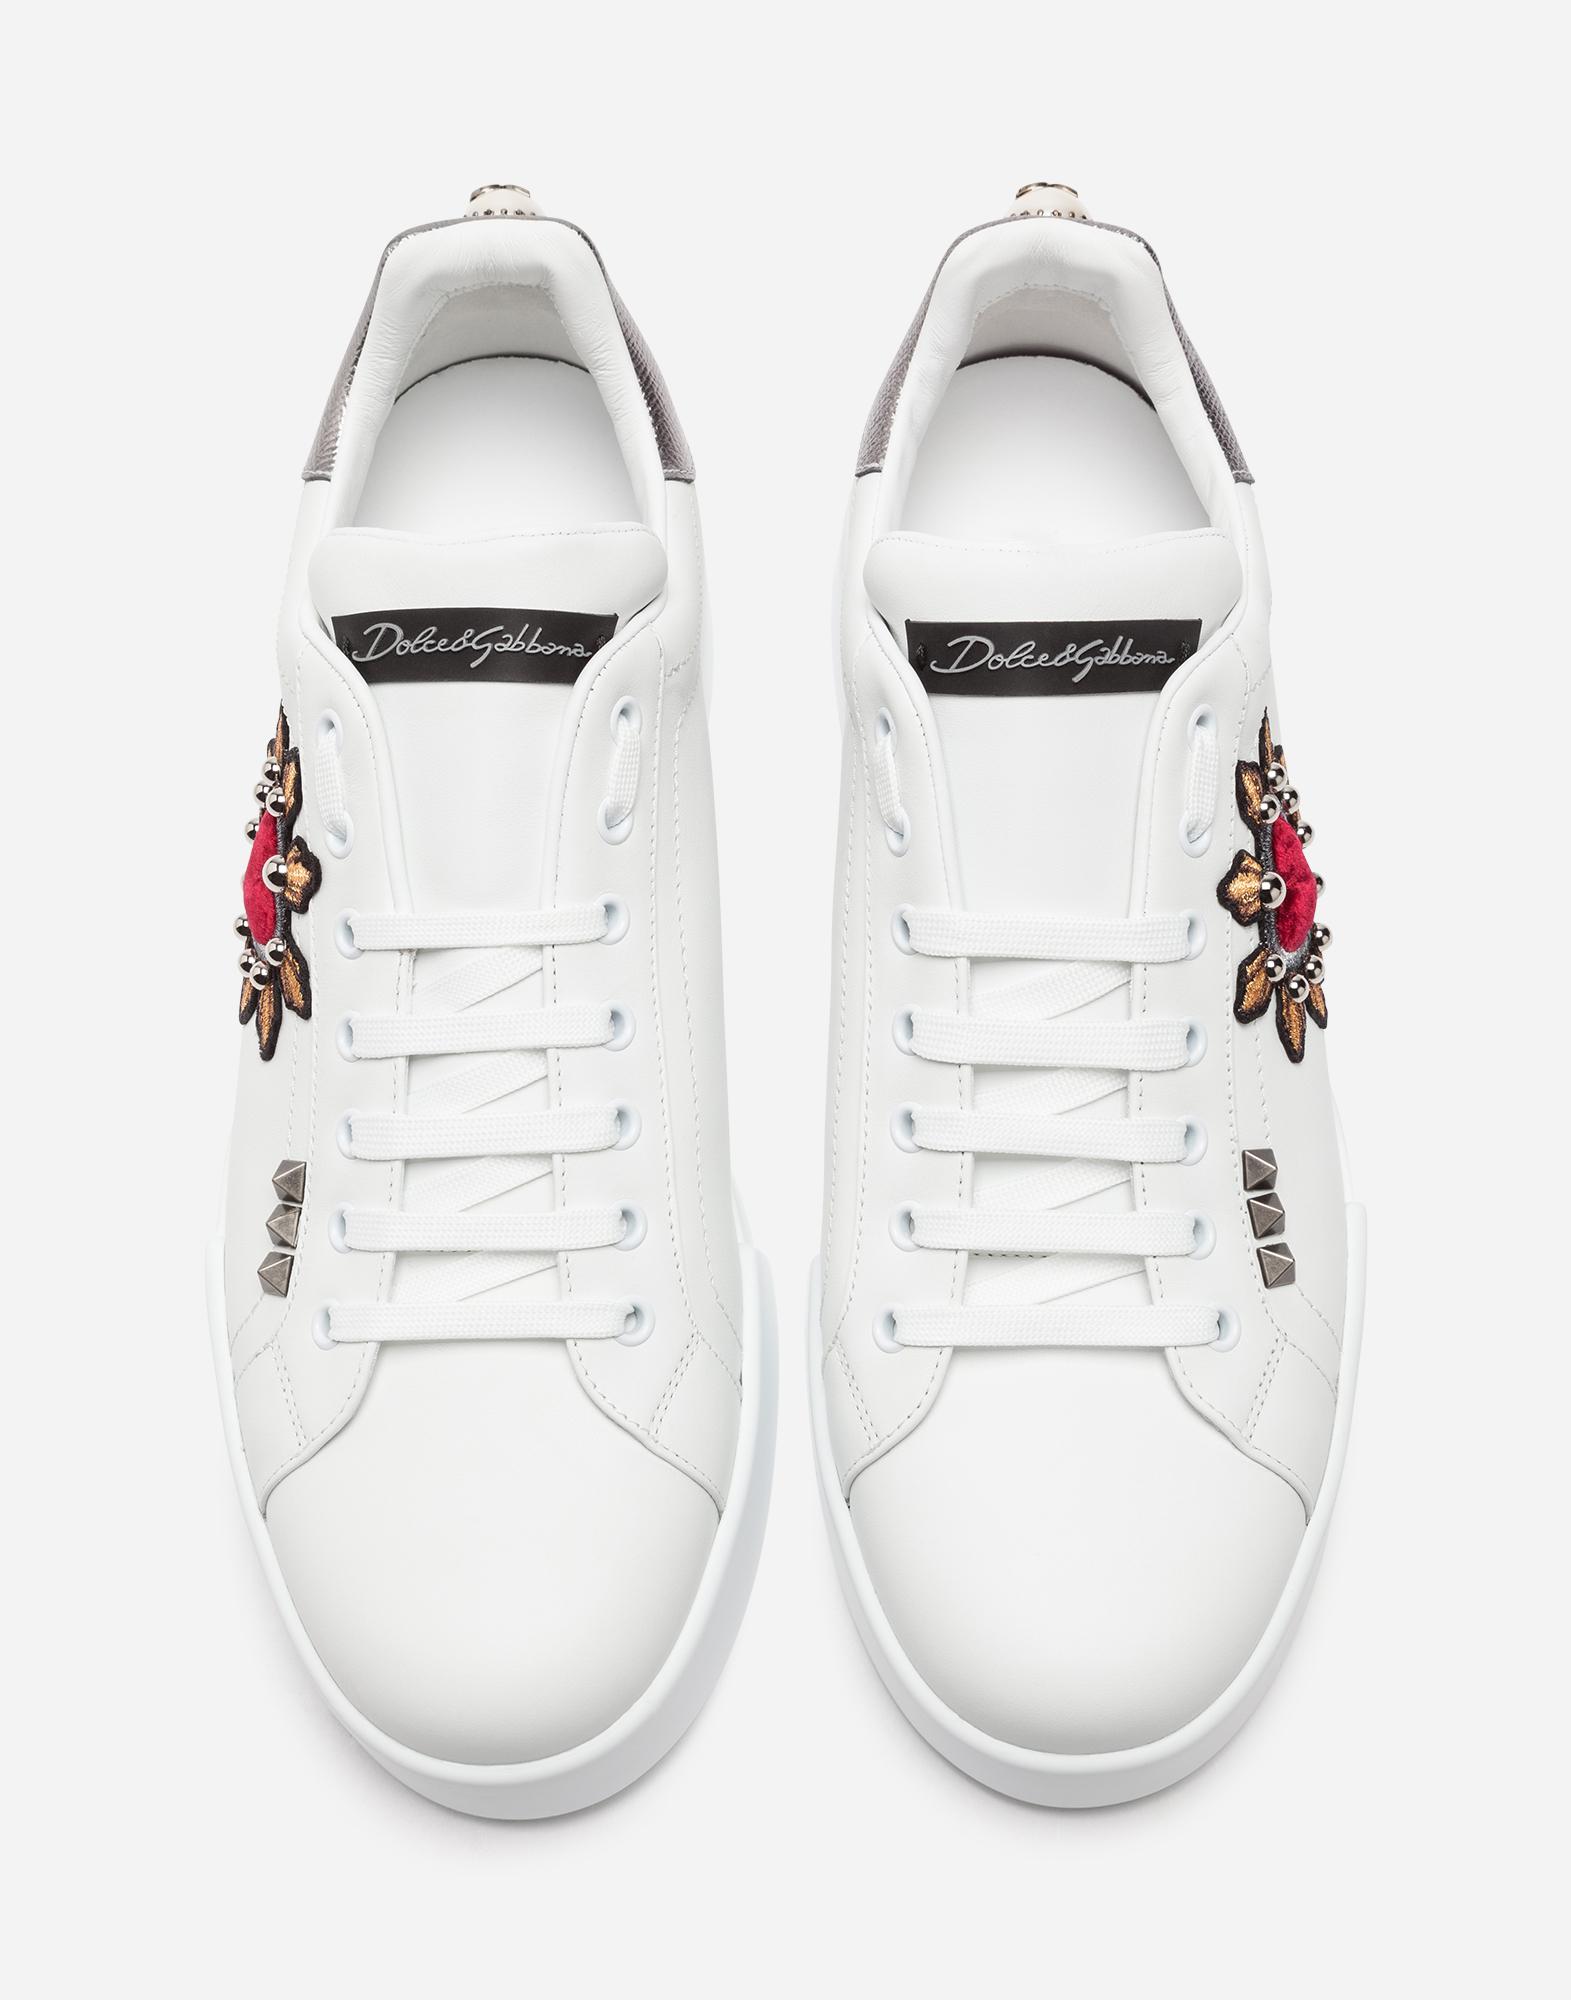 Dolce & Gabbana CALFSKIN NAPPA PORTOFINO SNEAKERS WITH PATCH